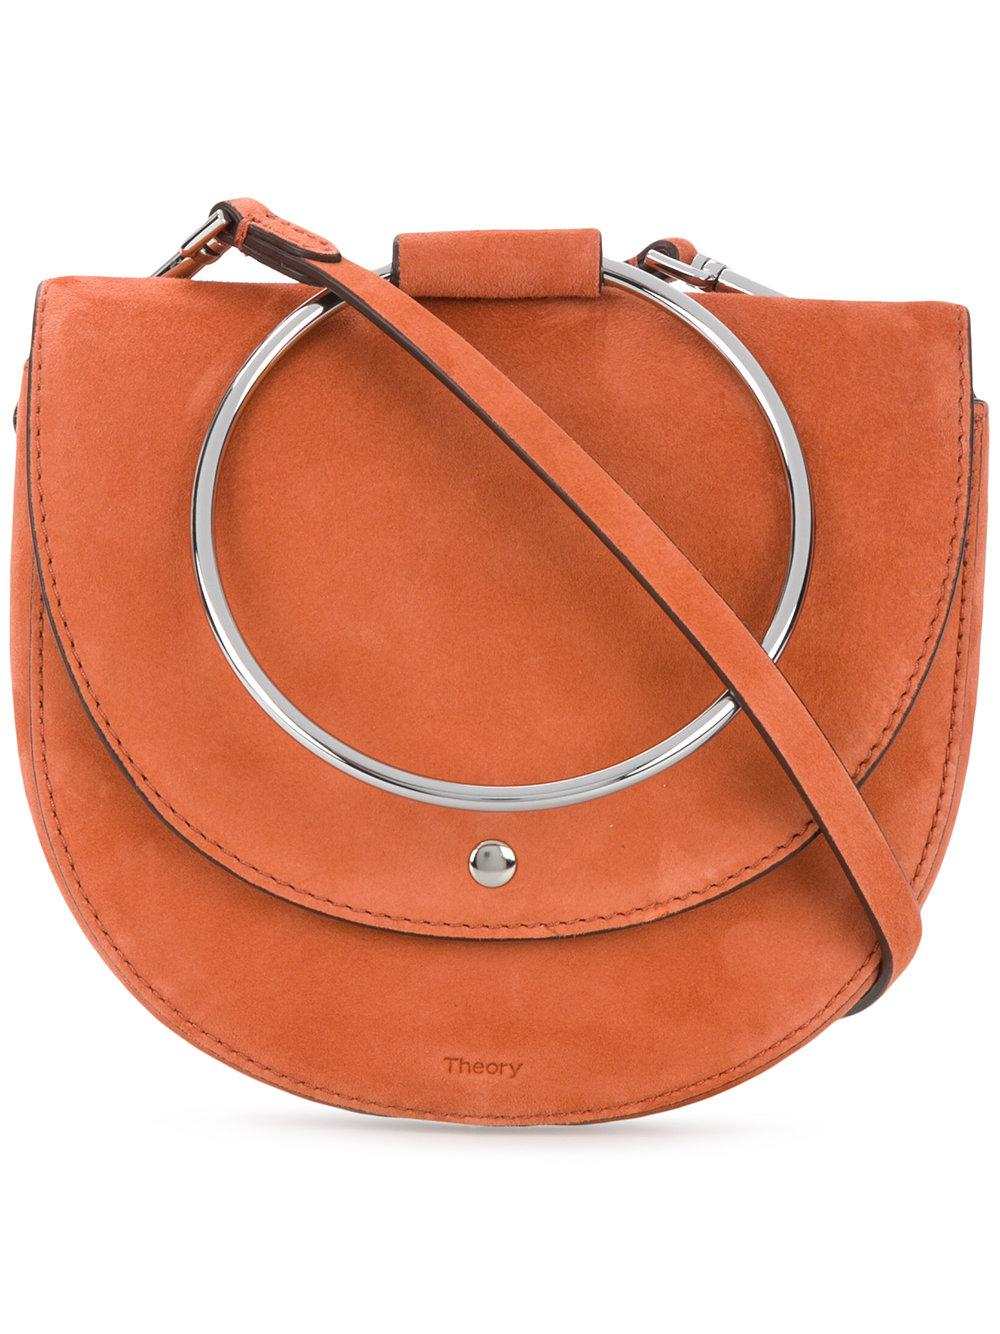 Theory Whitney Bag